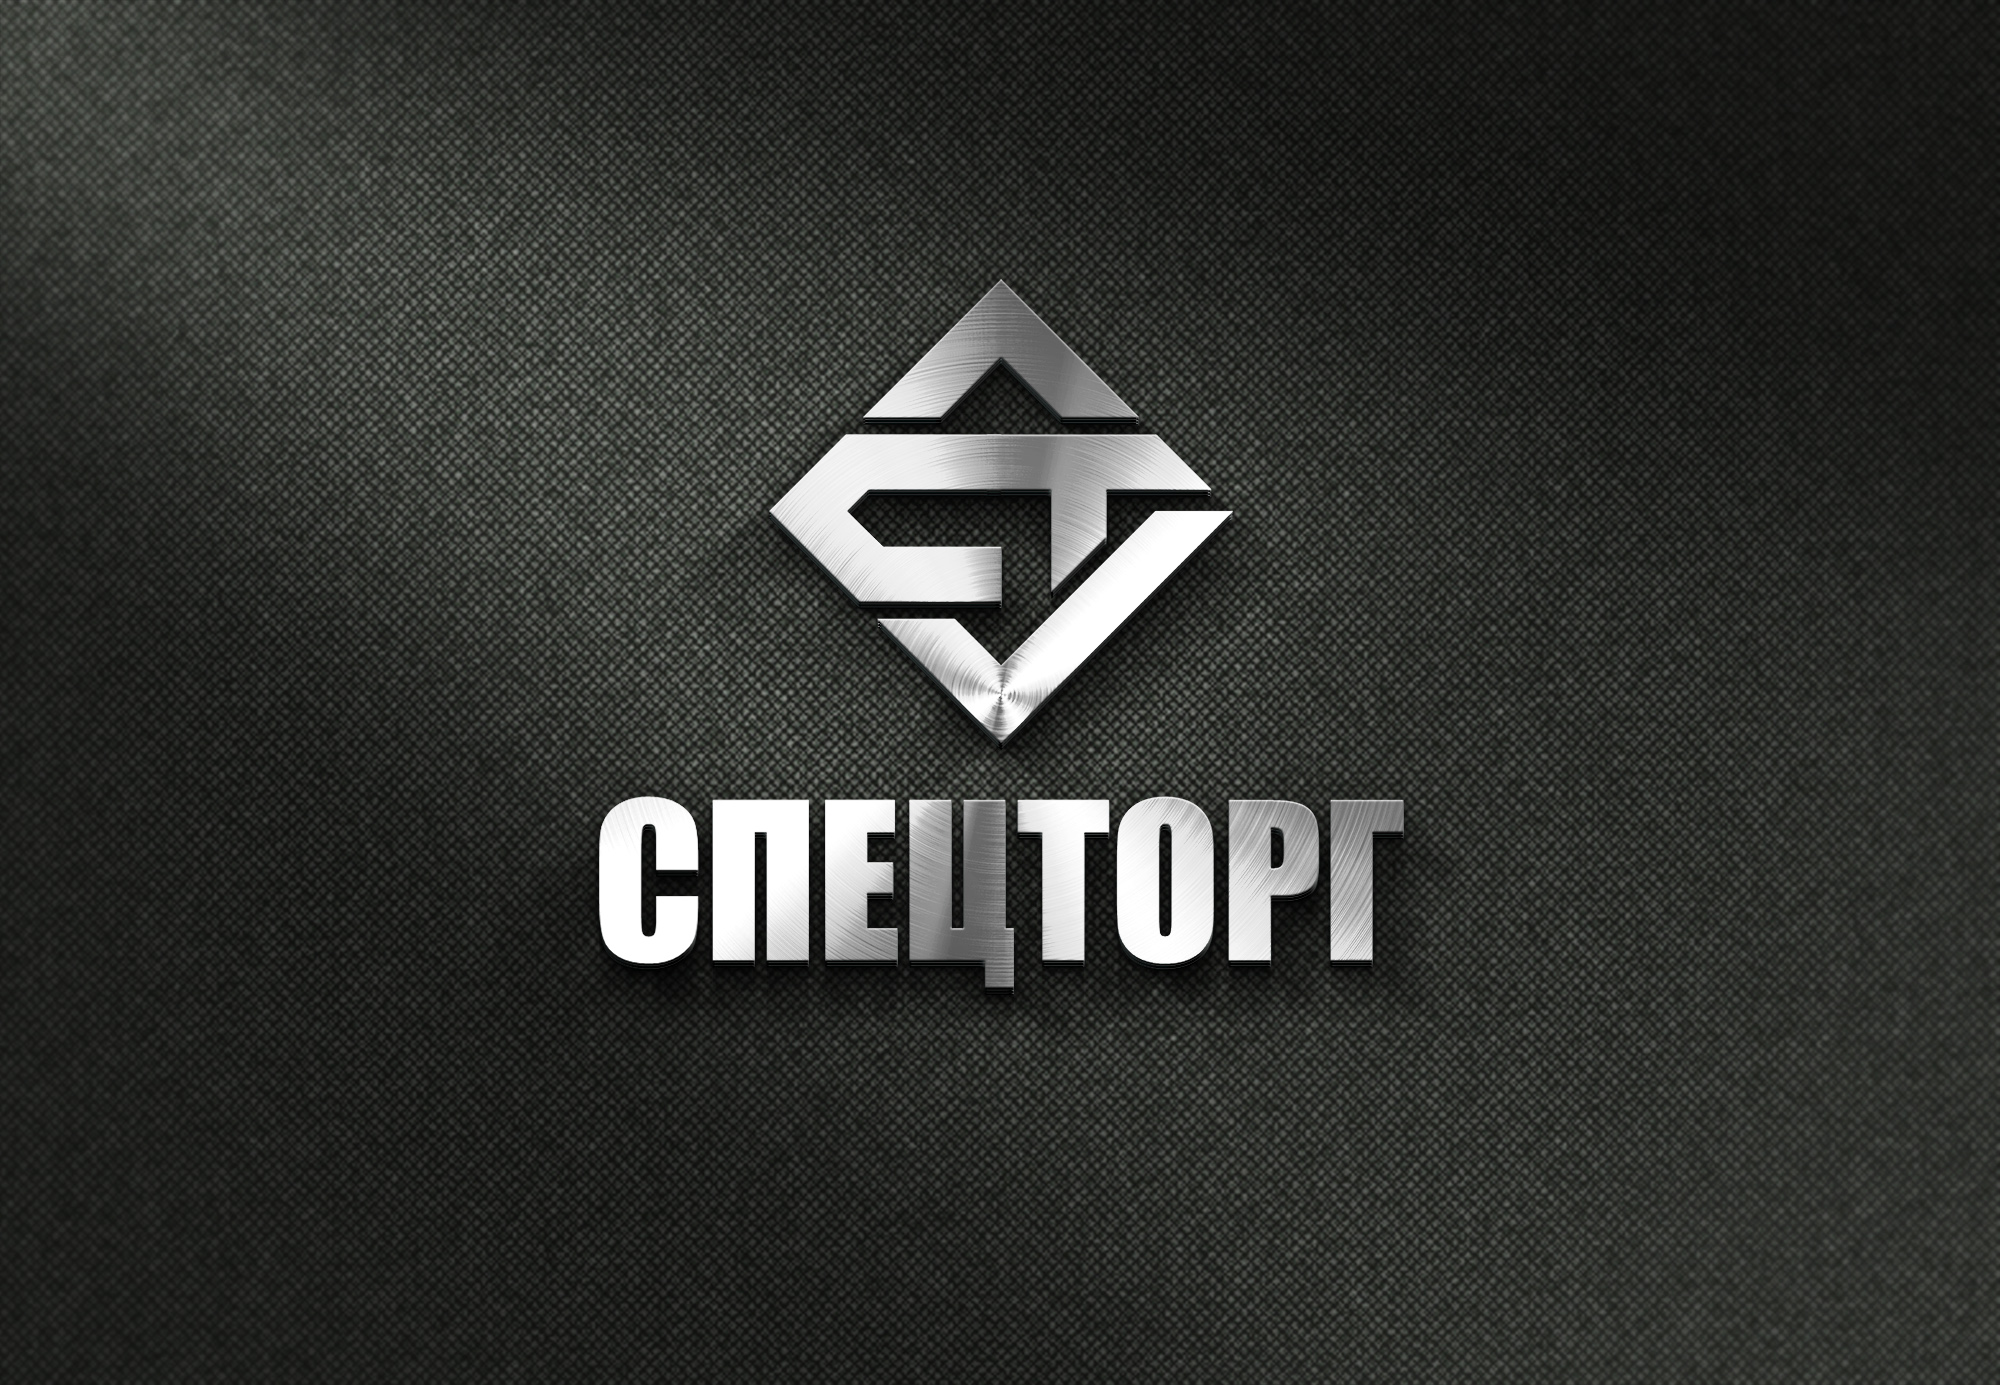 Разработать дизайн  логотипа компании фото f_0795dd2799dd55f0.jpg